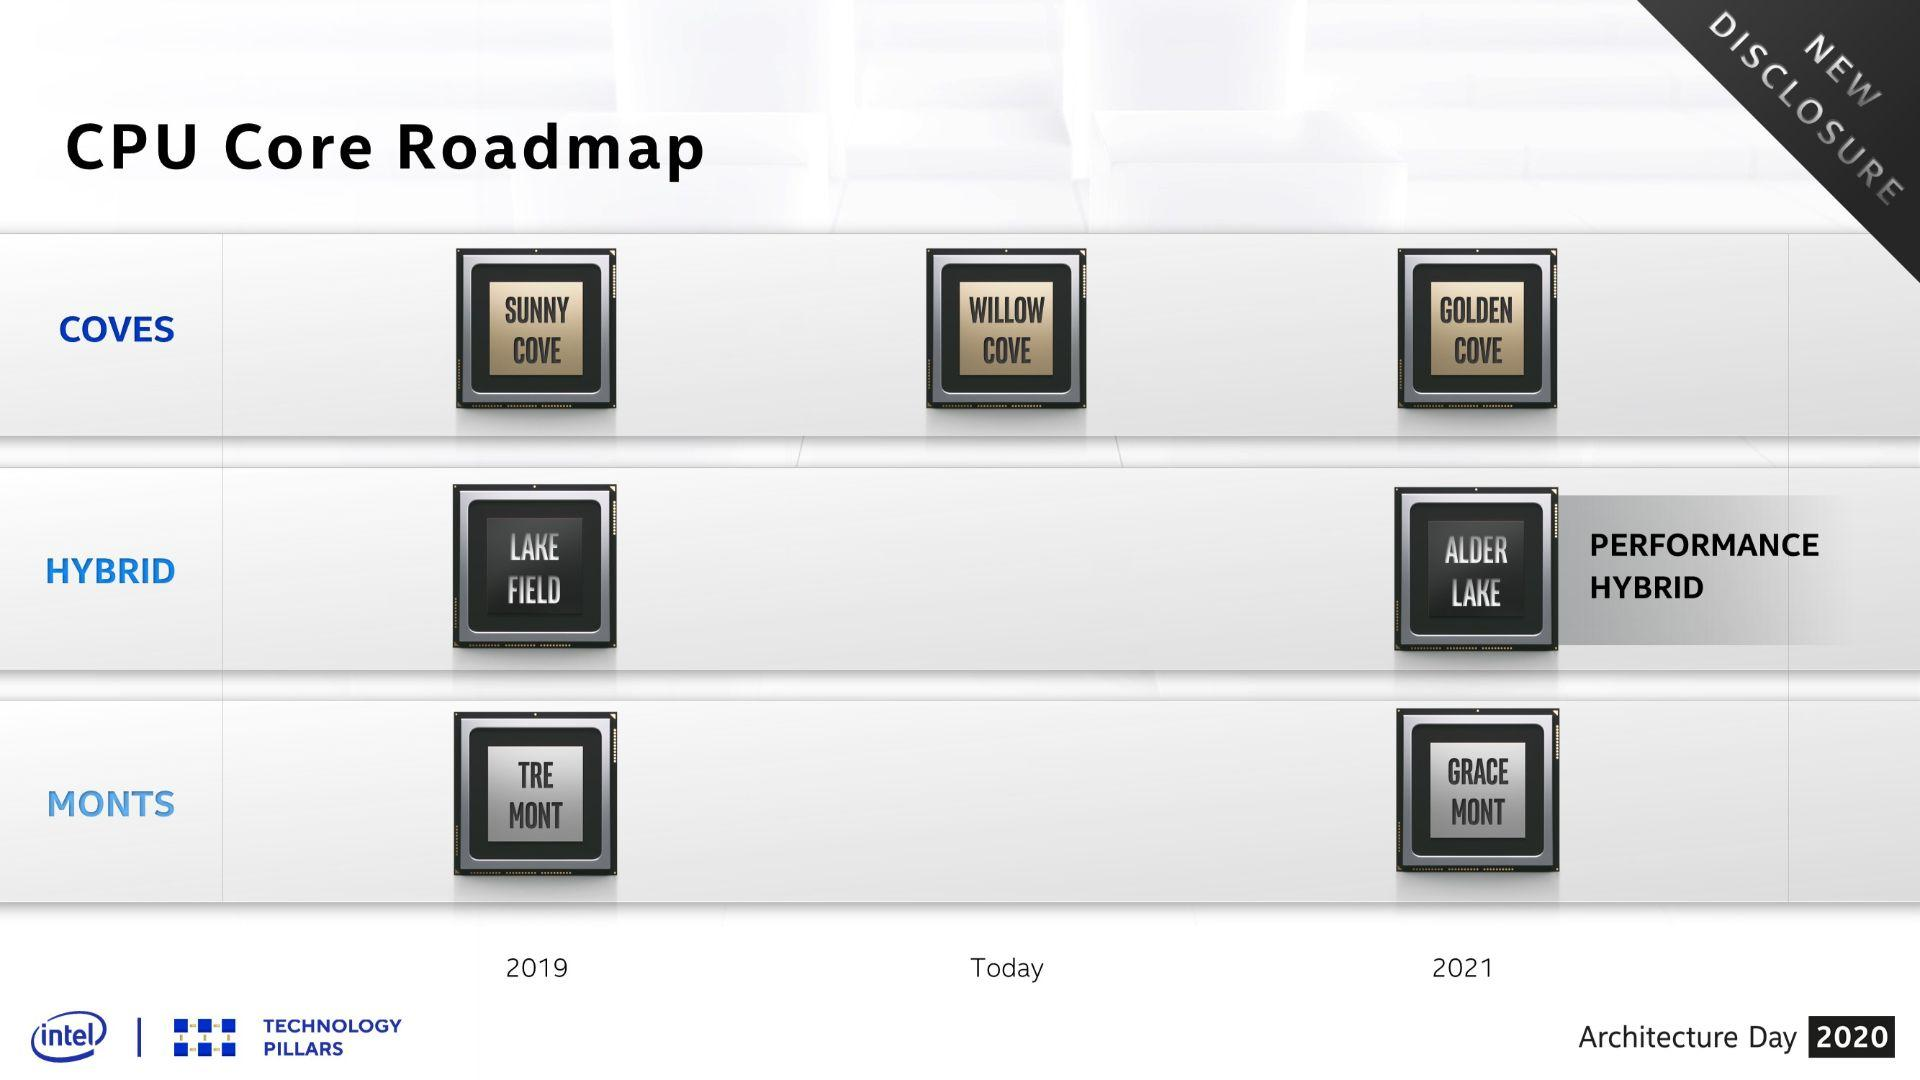 Intel Architecture Day Roadmap Golden Cove Gracemont Alder Lake